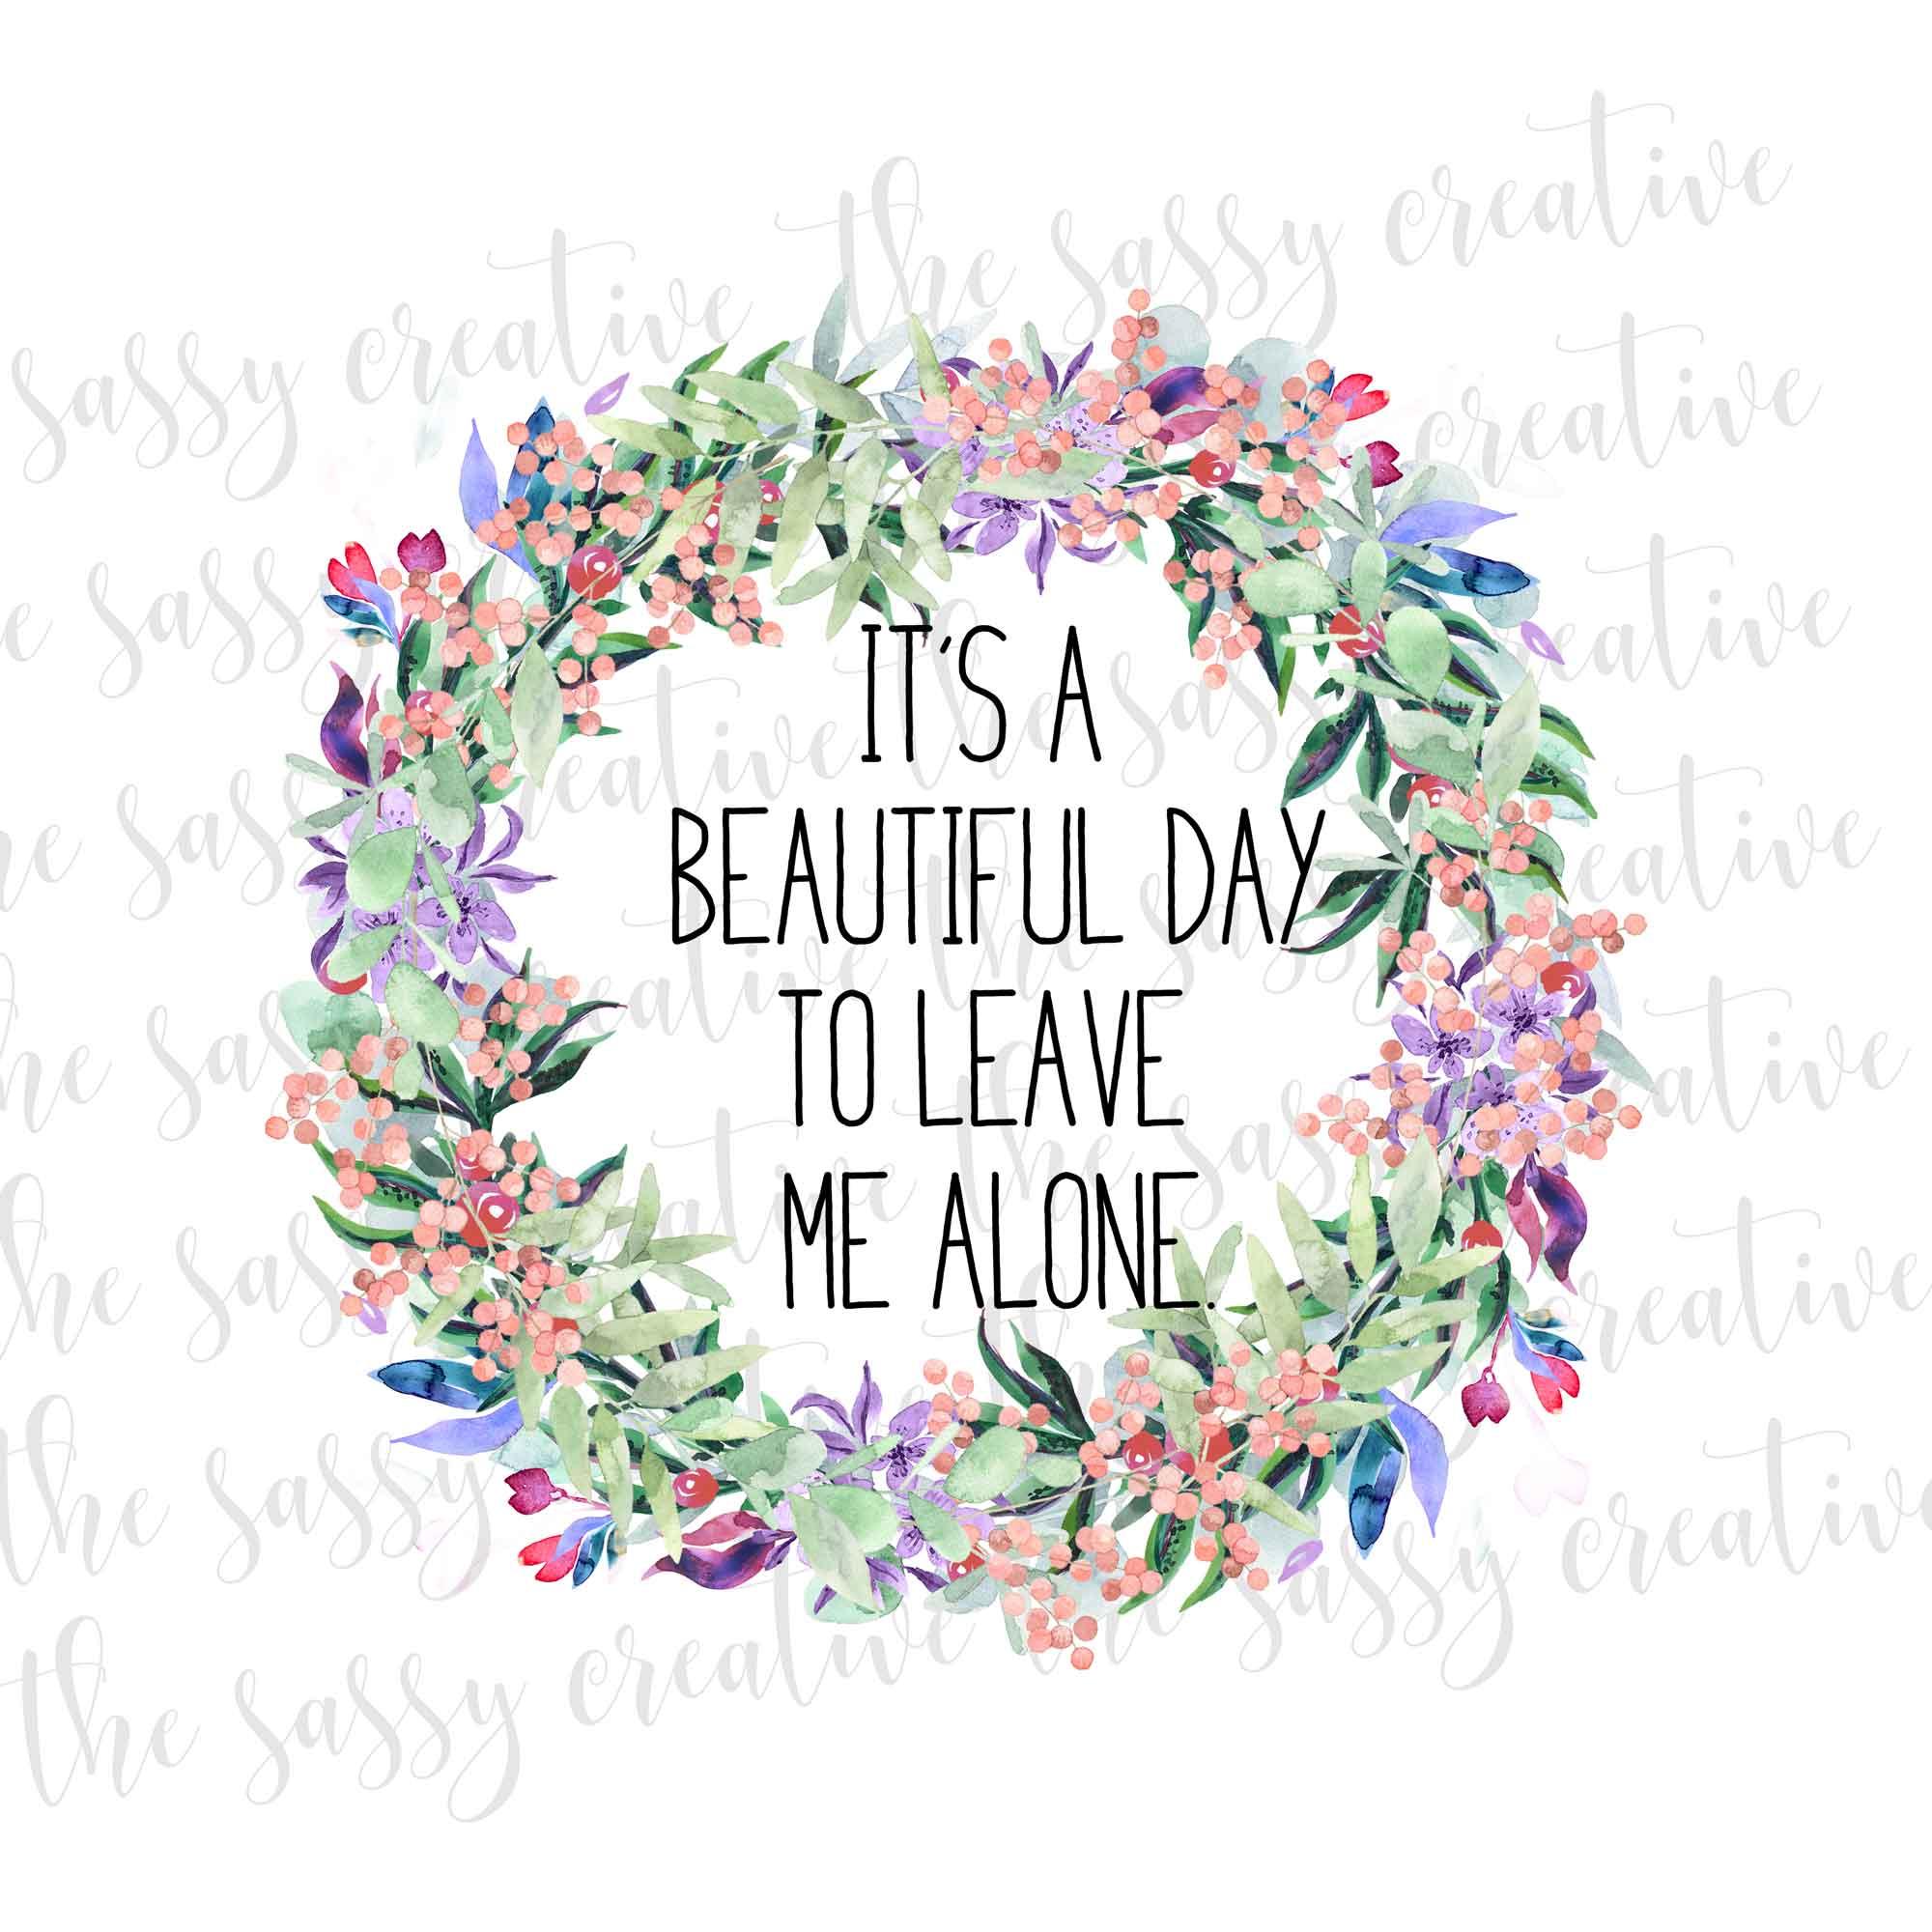 beautifuldaytoleavemealonecover